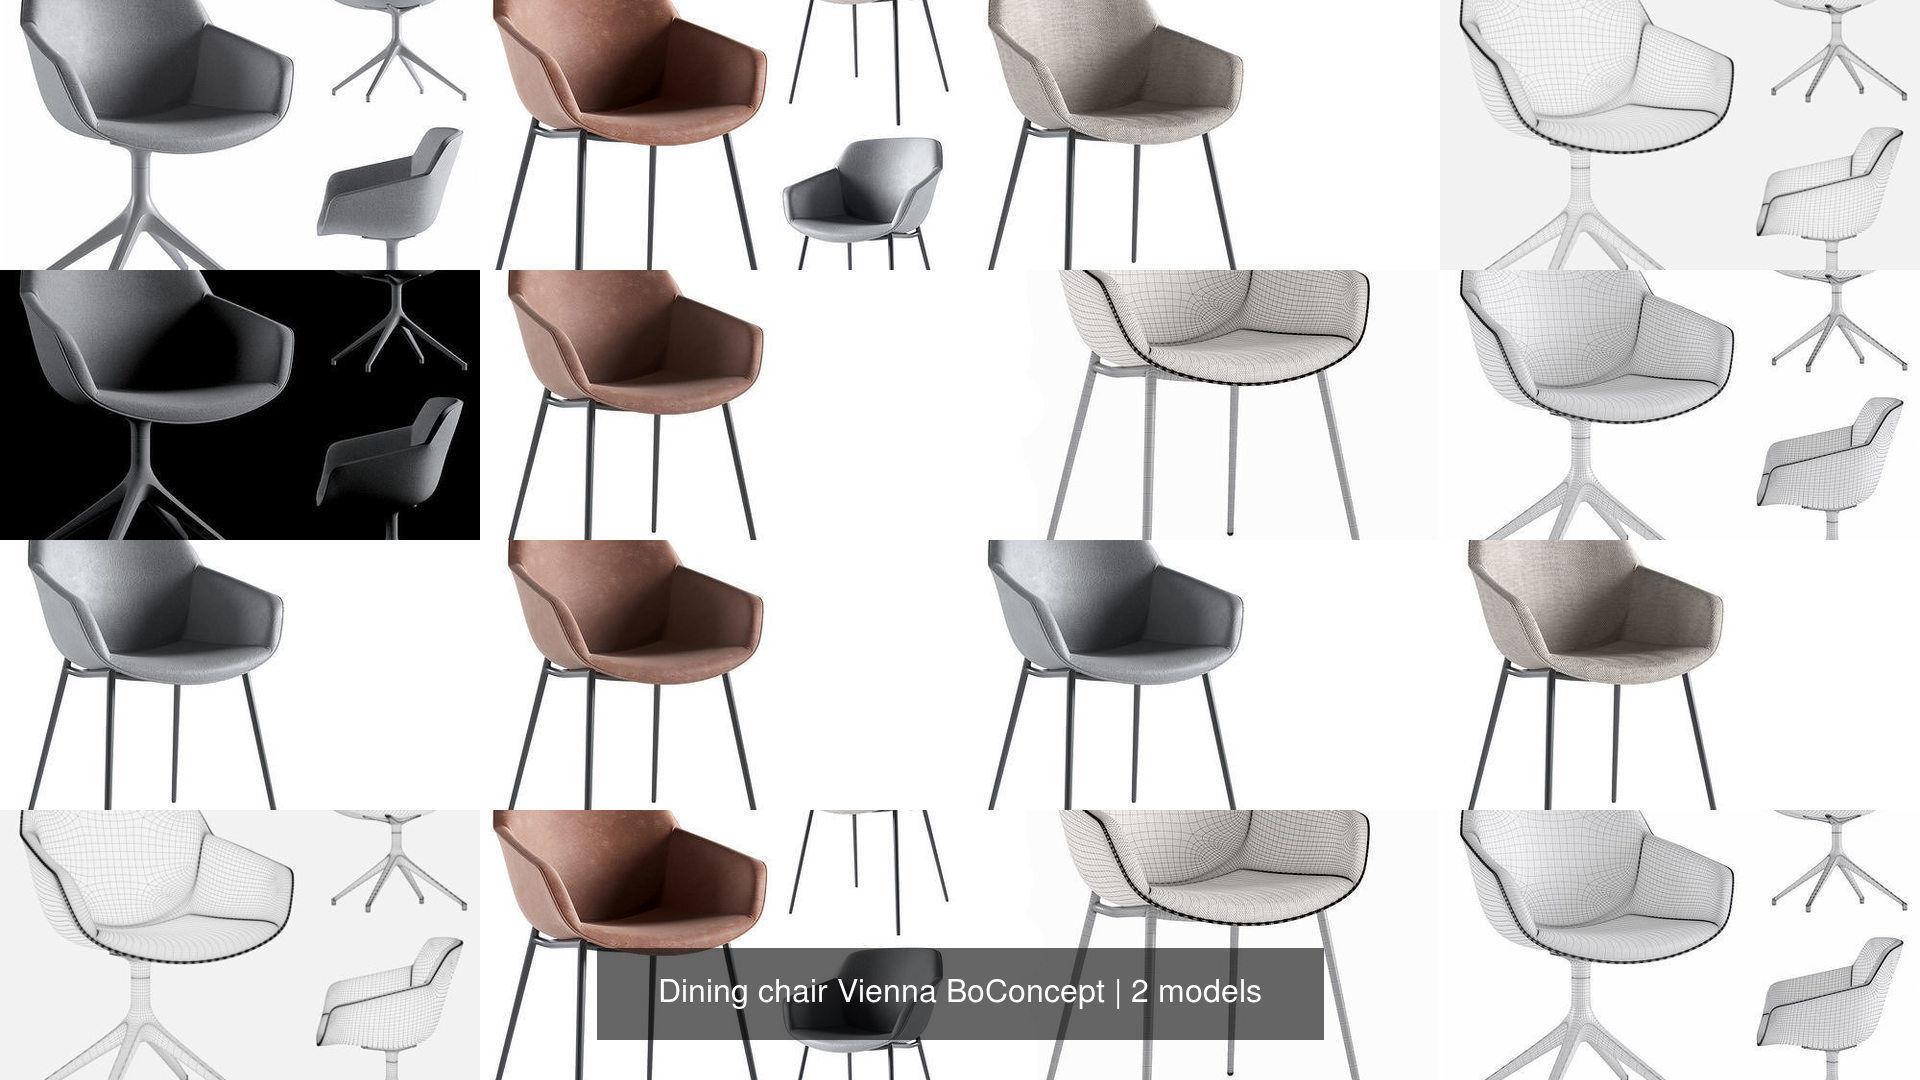 Dining chair Vienna BoConcept